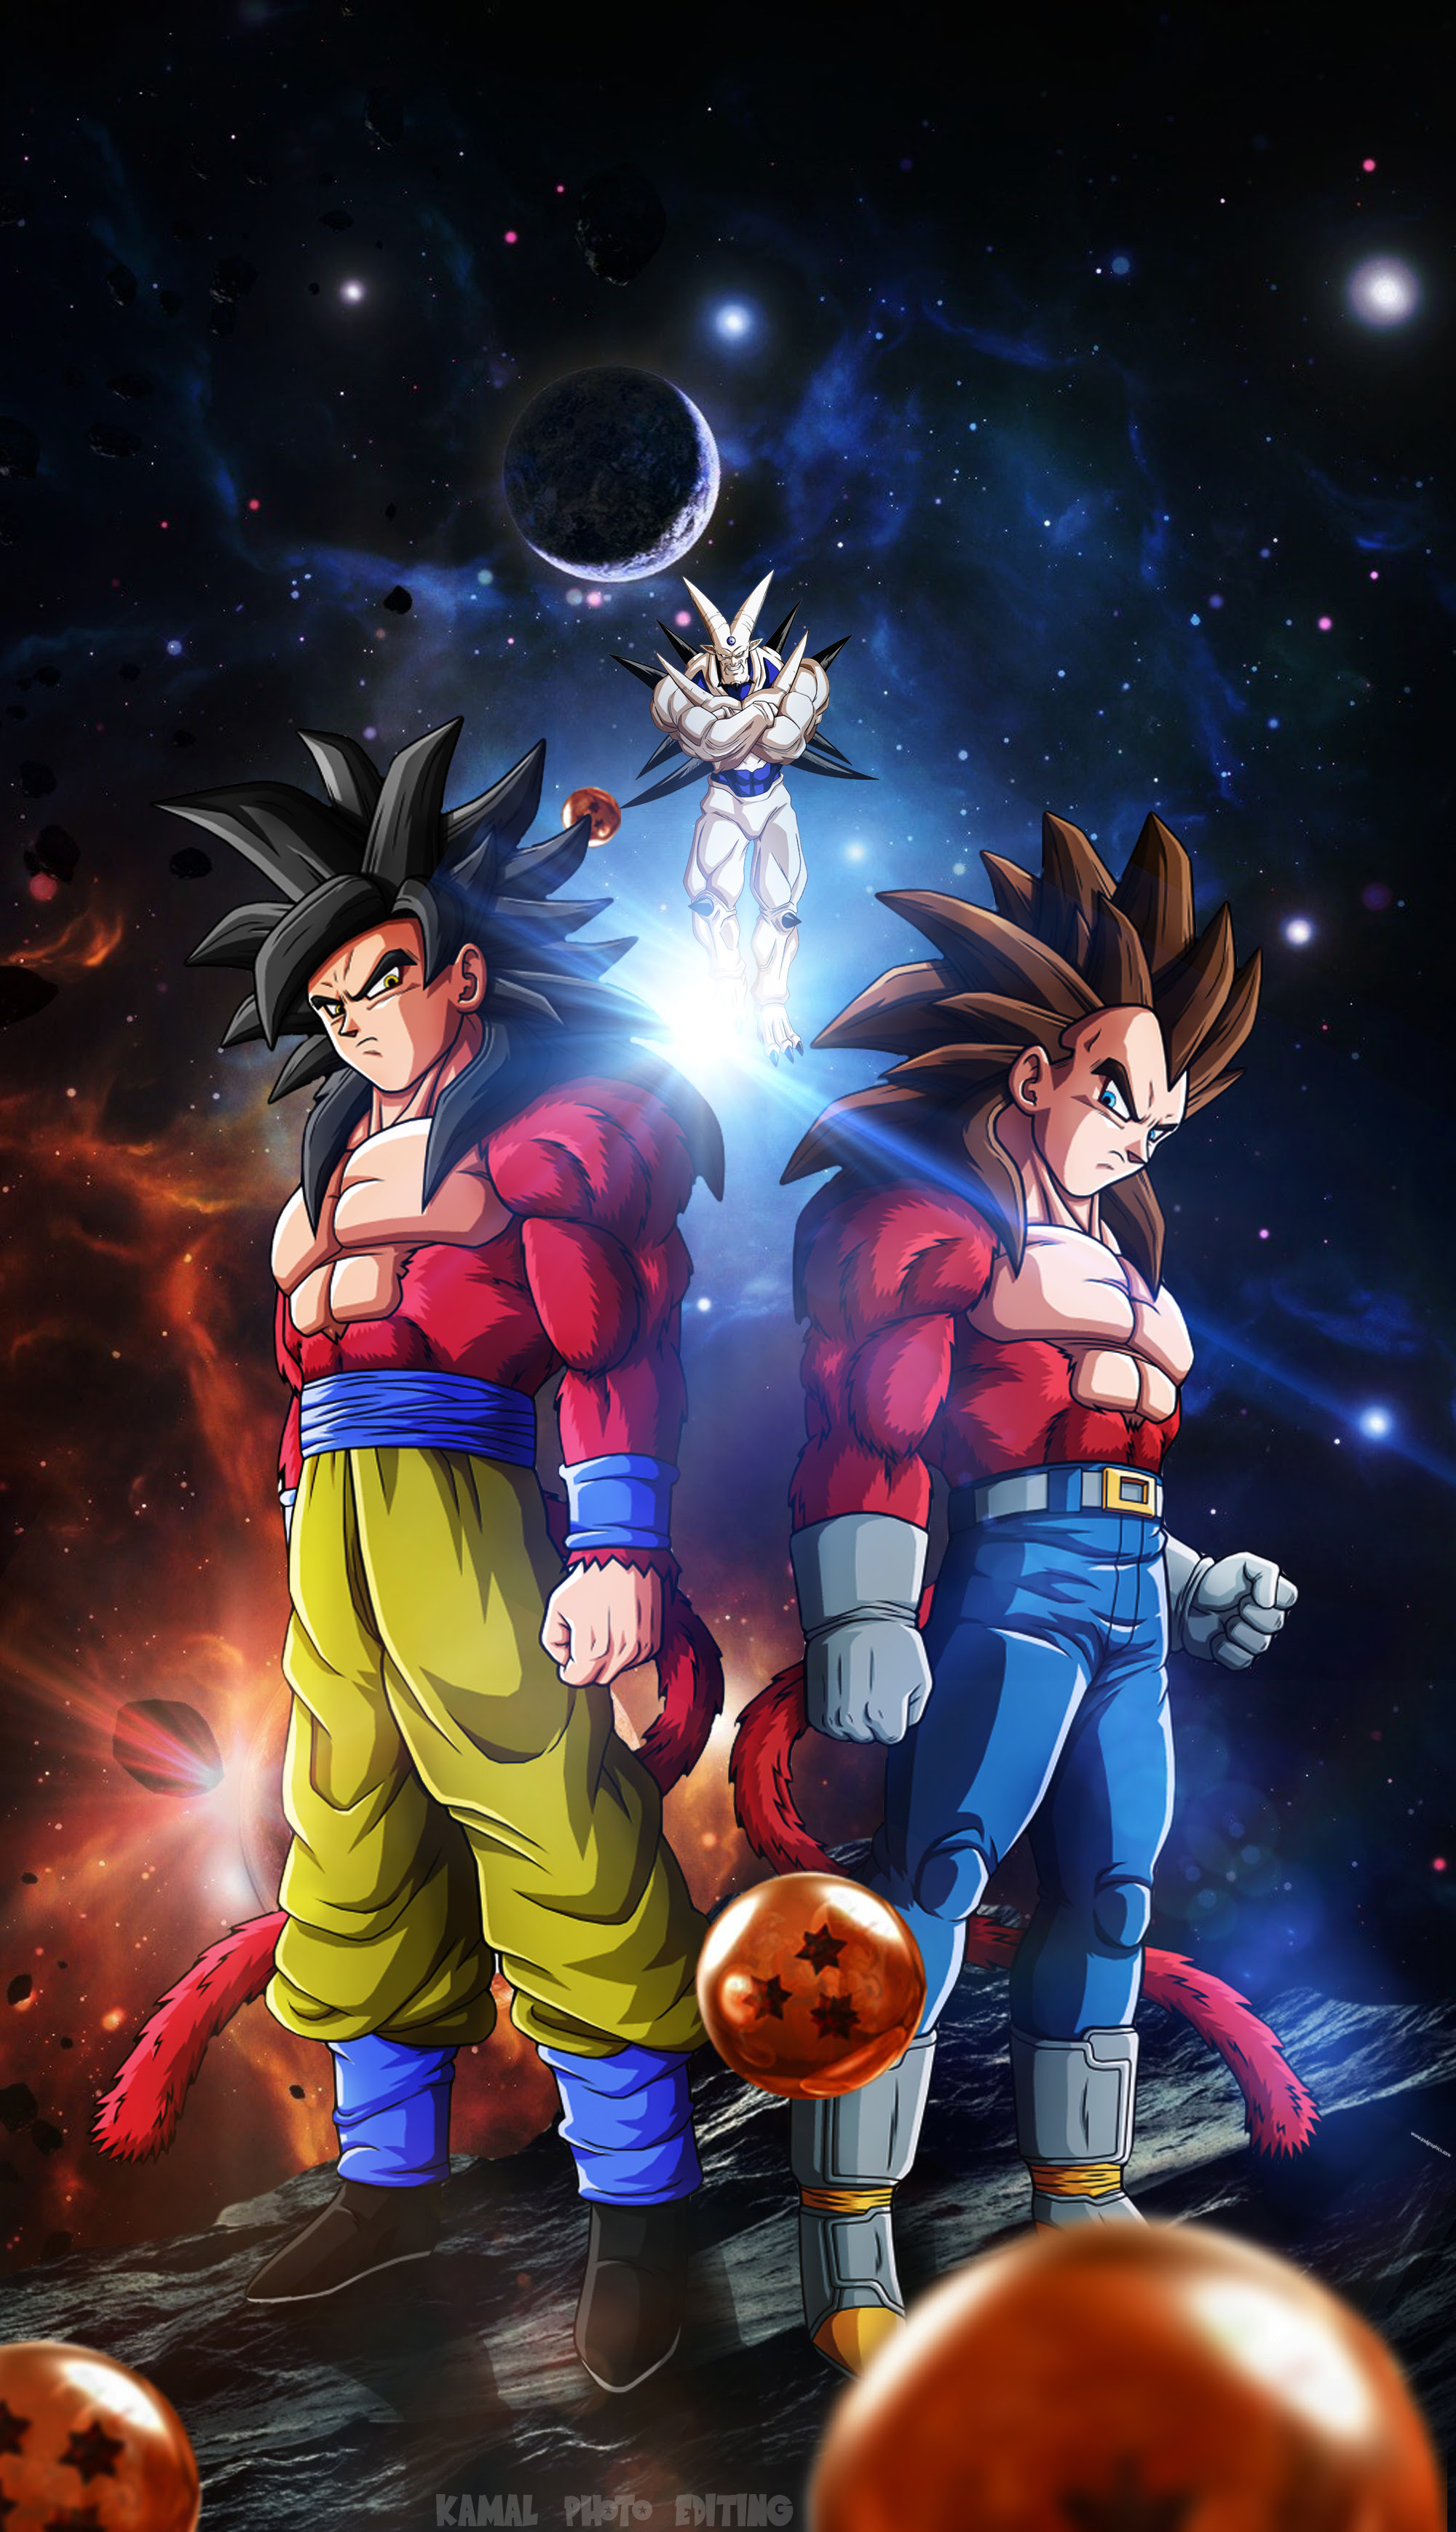 Goku 4k Wallpaper For Mobile Gambarku